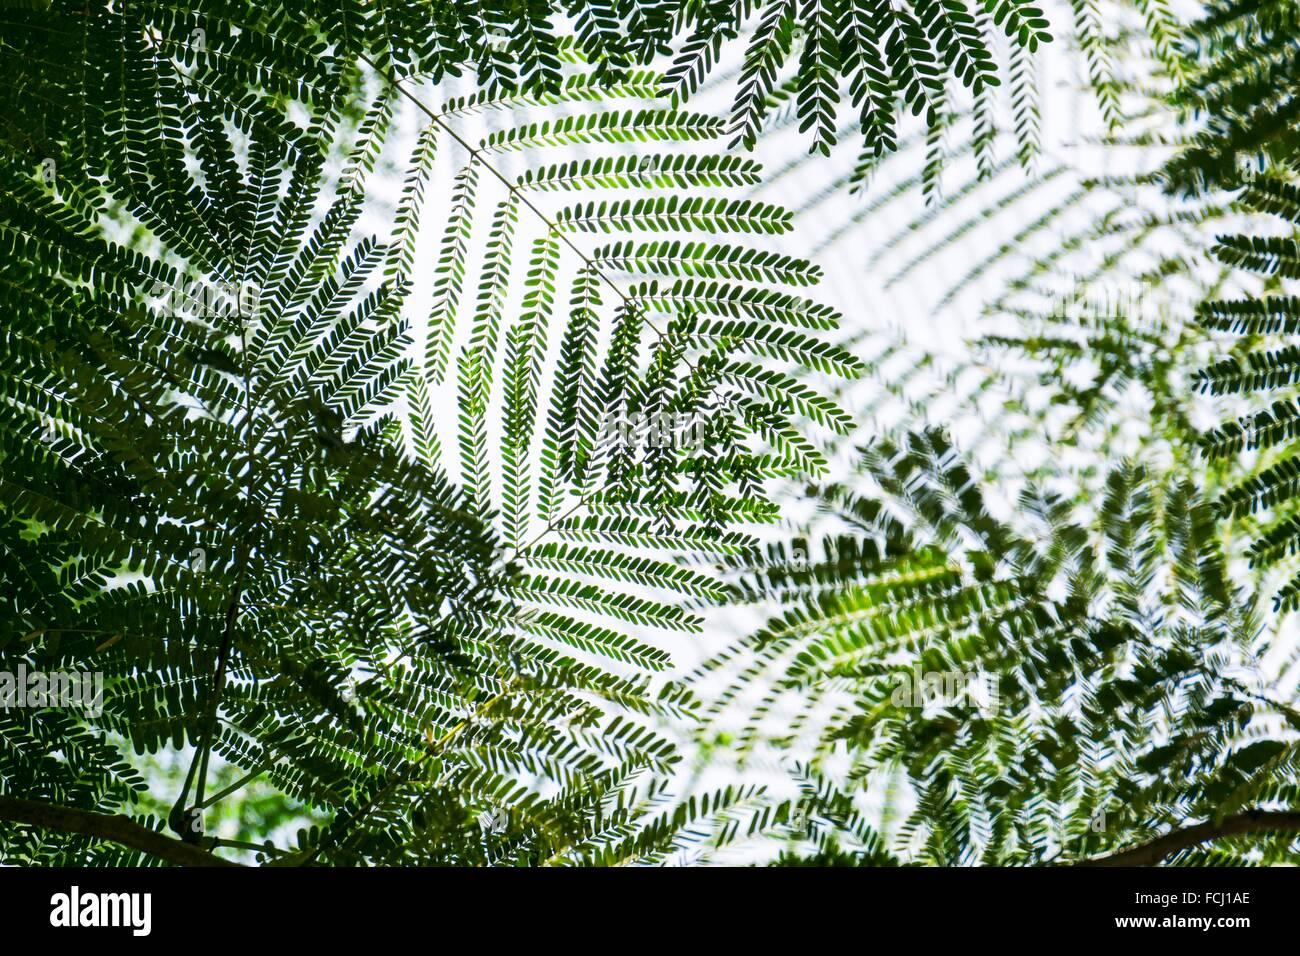 Shooting backlit hairy leaves at Semengoh Wildlife Centre, Kuching, Sarawak, Malaysia. Stock Photo